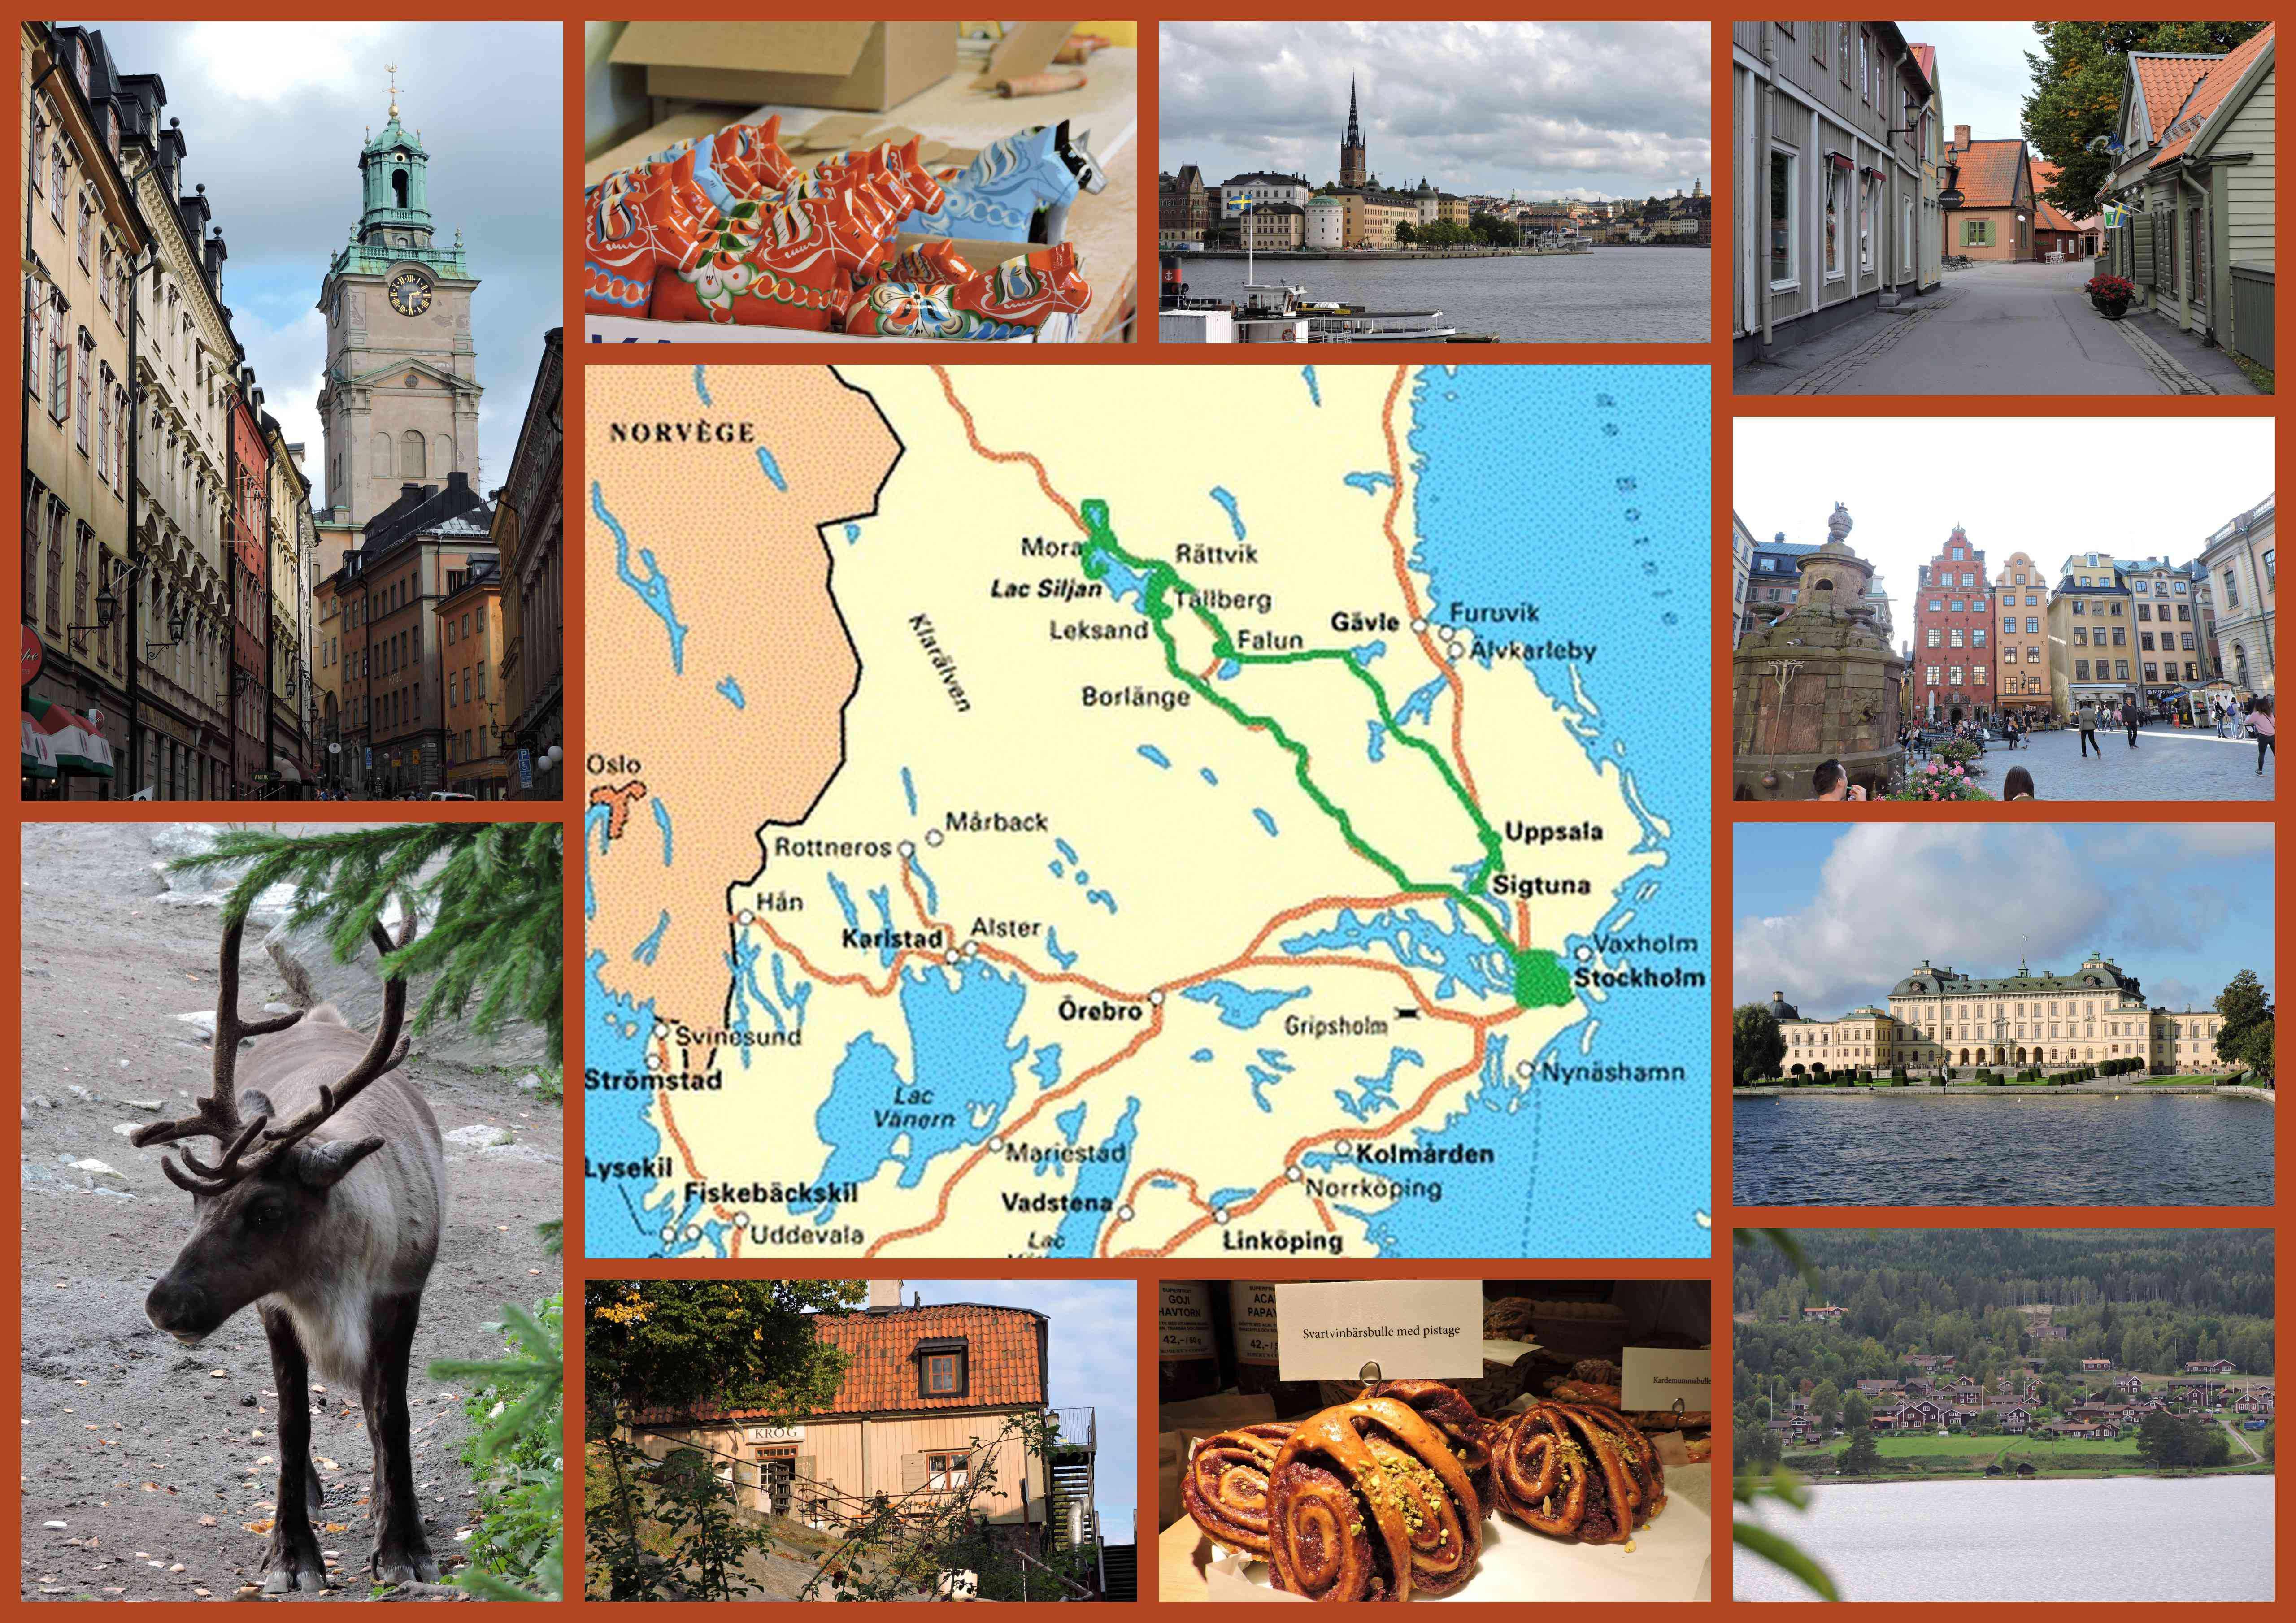 voyage suede stockholm dalecarlie road trip